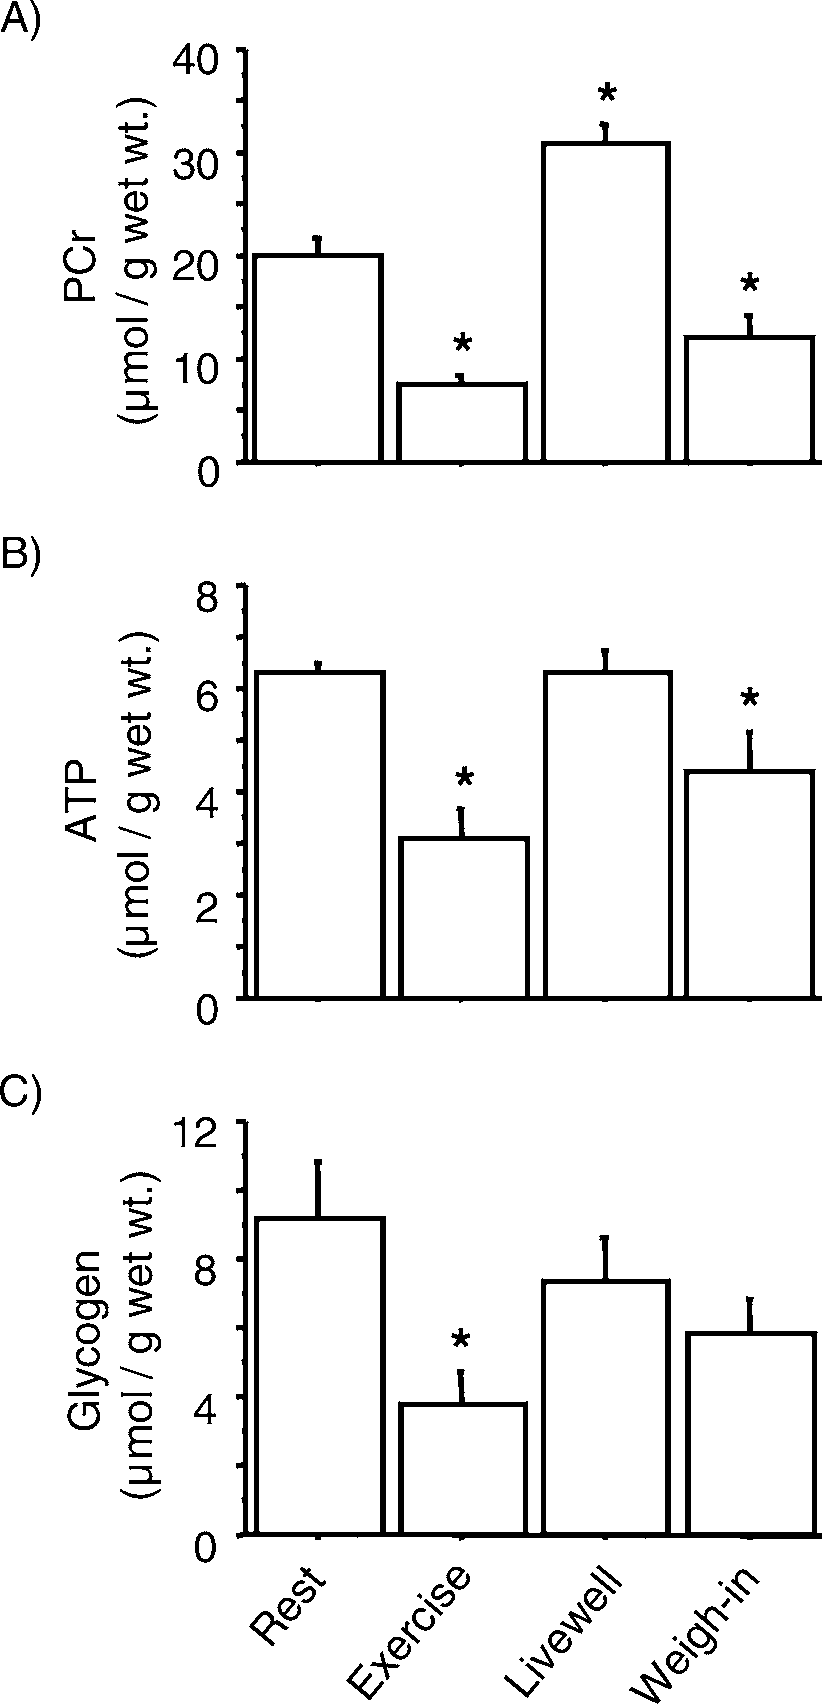 medium resolution of  a white muscle phosphocreatine pcr b adenosine triphosphate download scientific diagram